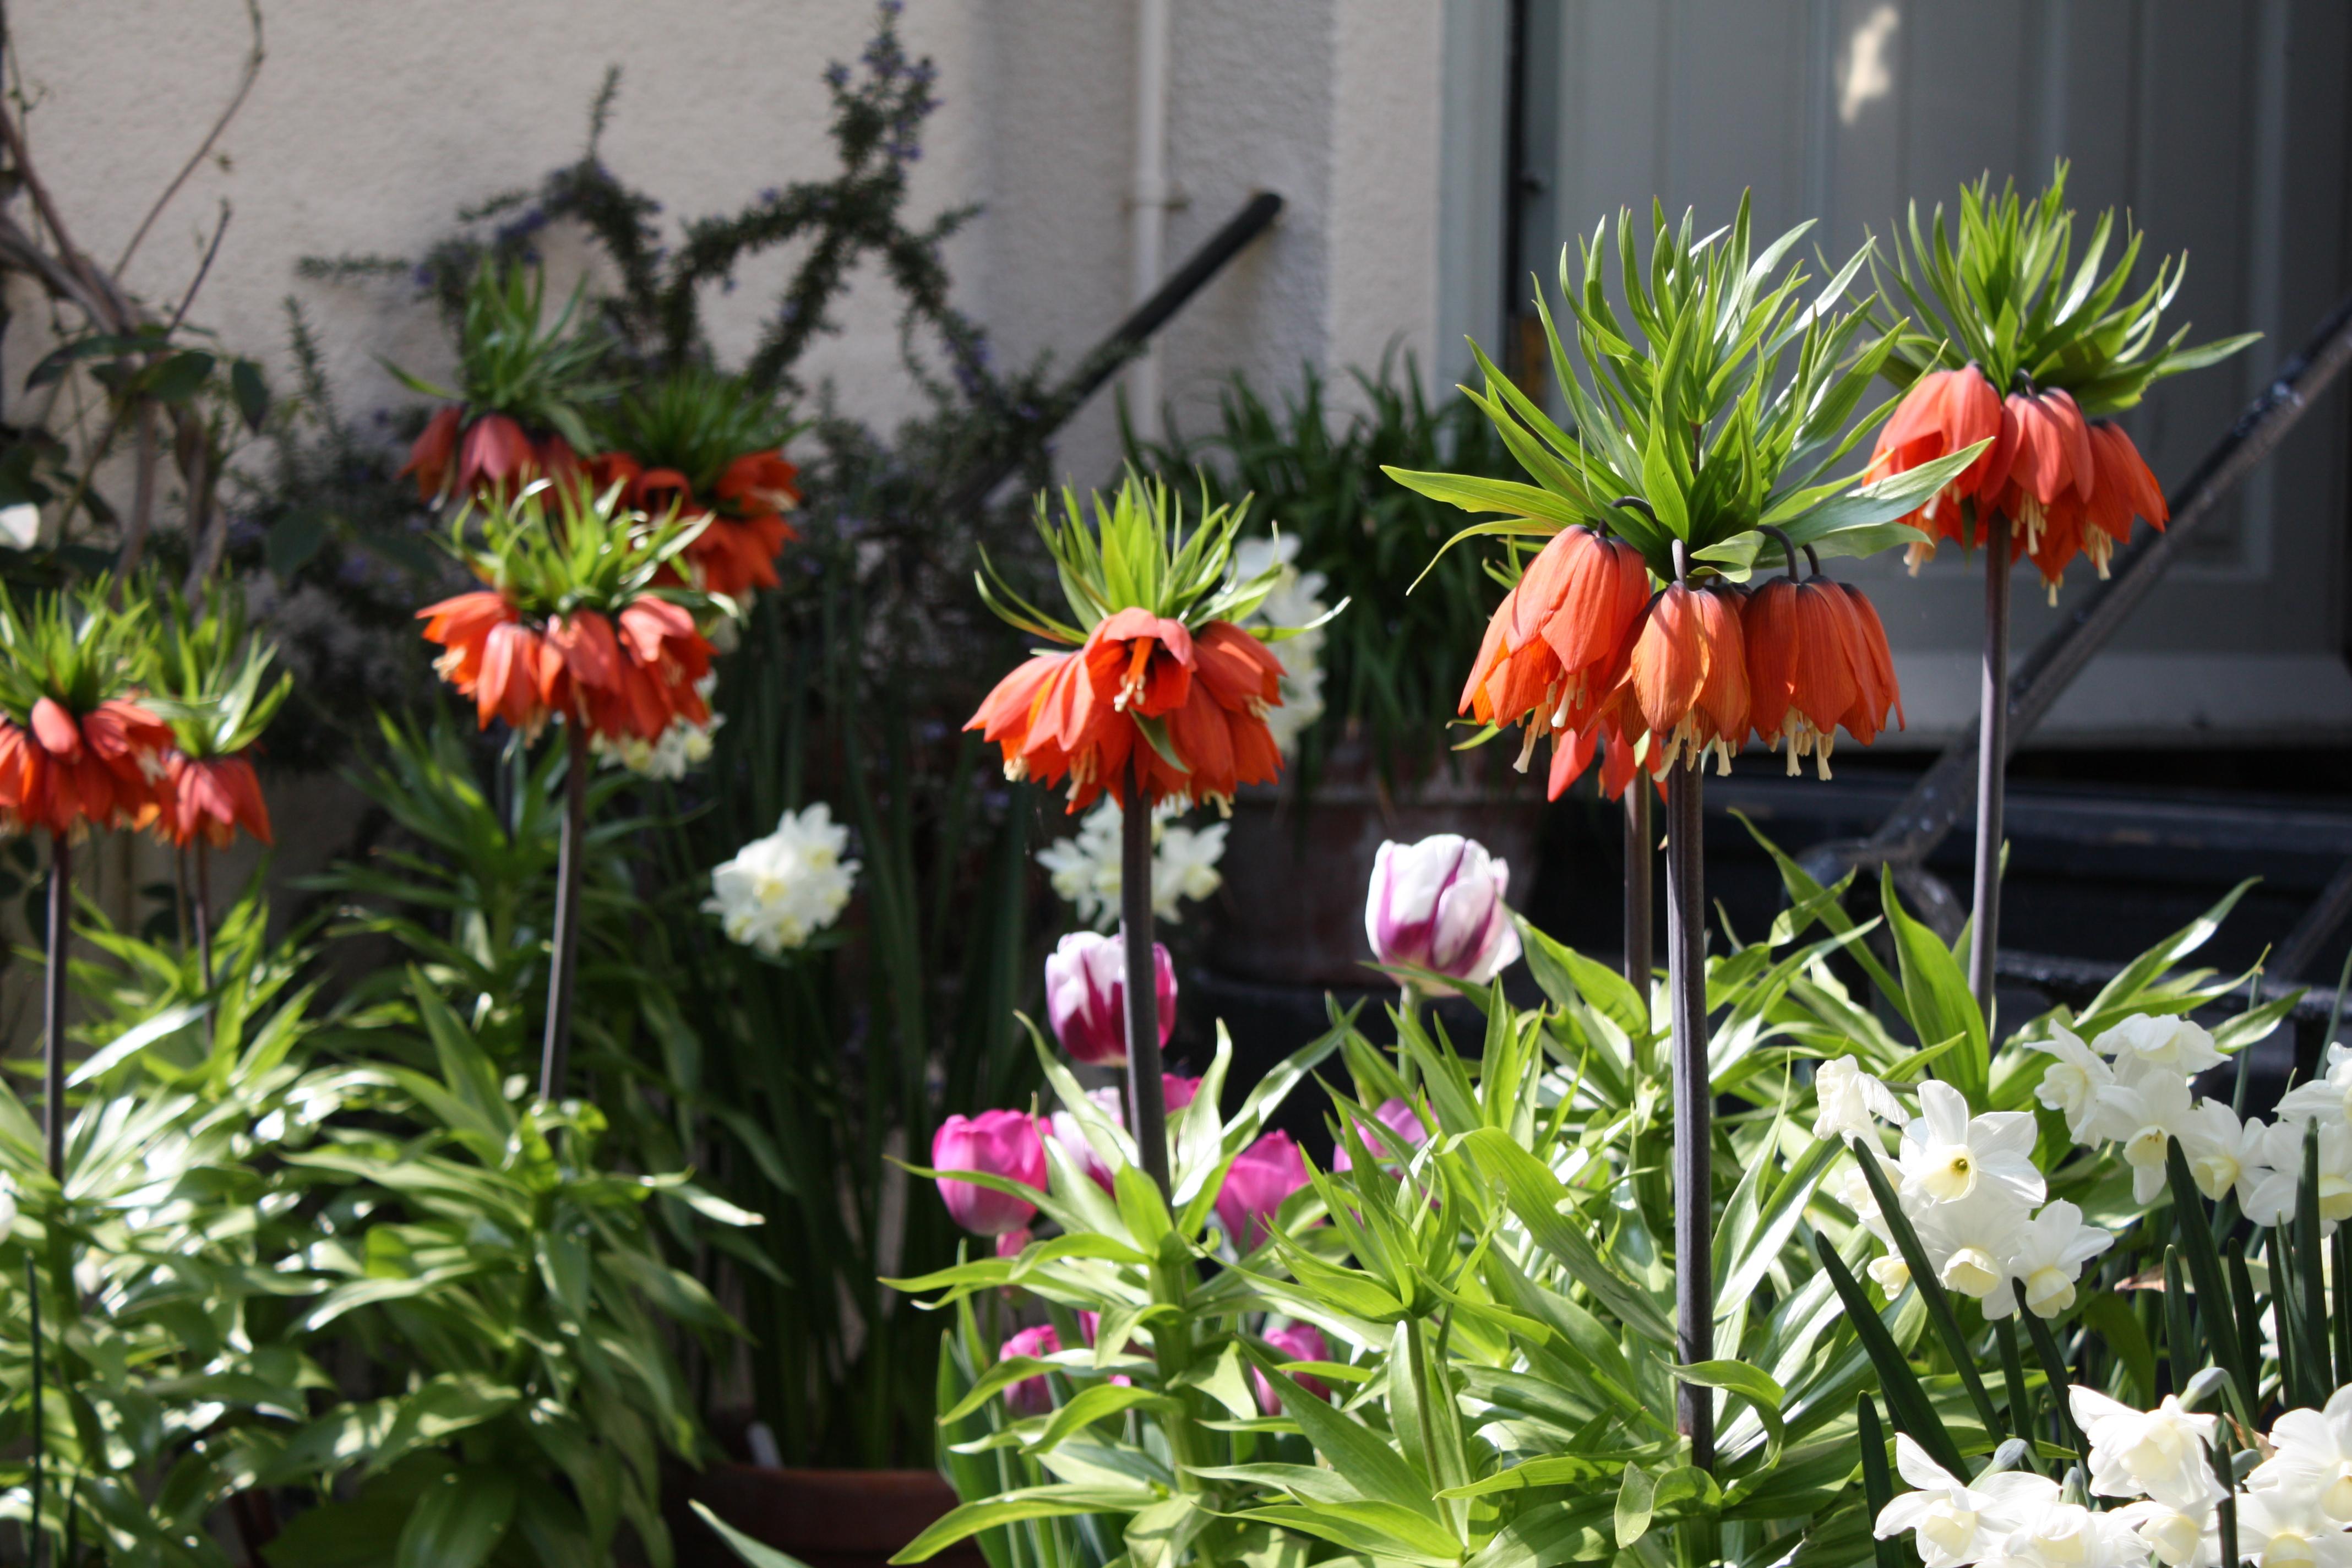 fritillaria imperialis william rex the frustrated gardener. Black Bedroom Furniture Sets. Home Design Ideas